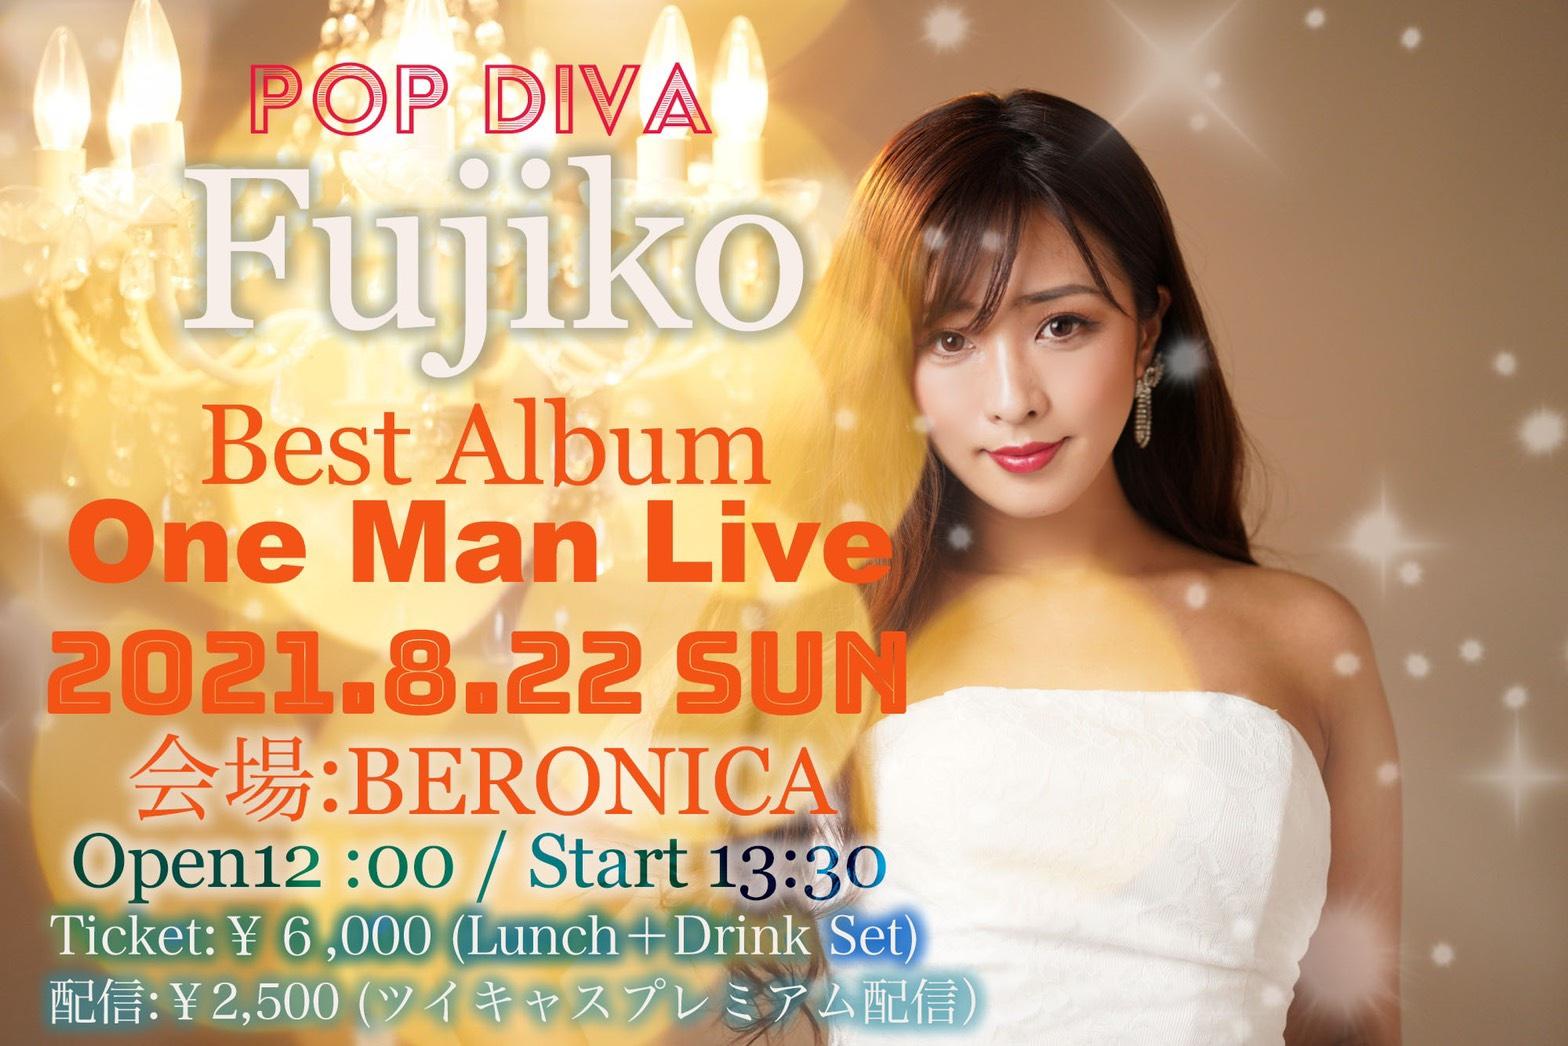 8/22 開催 【POP DIVA Fujiko Best Album One Man Live】